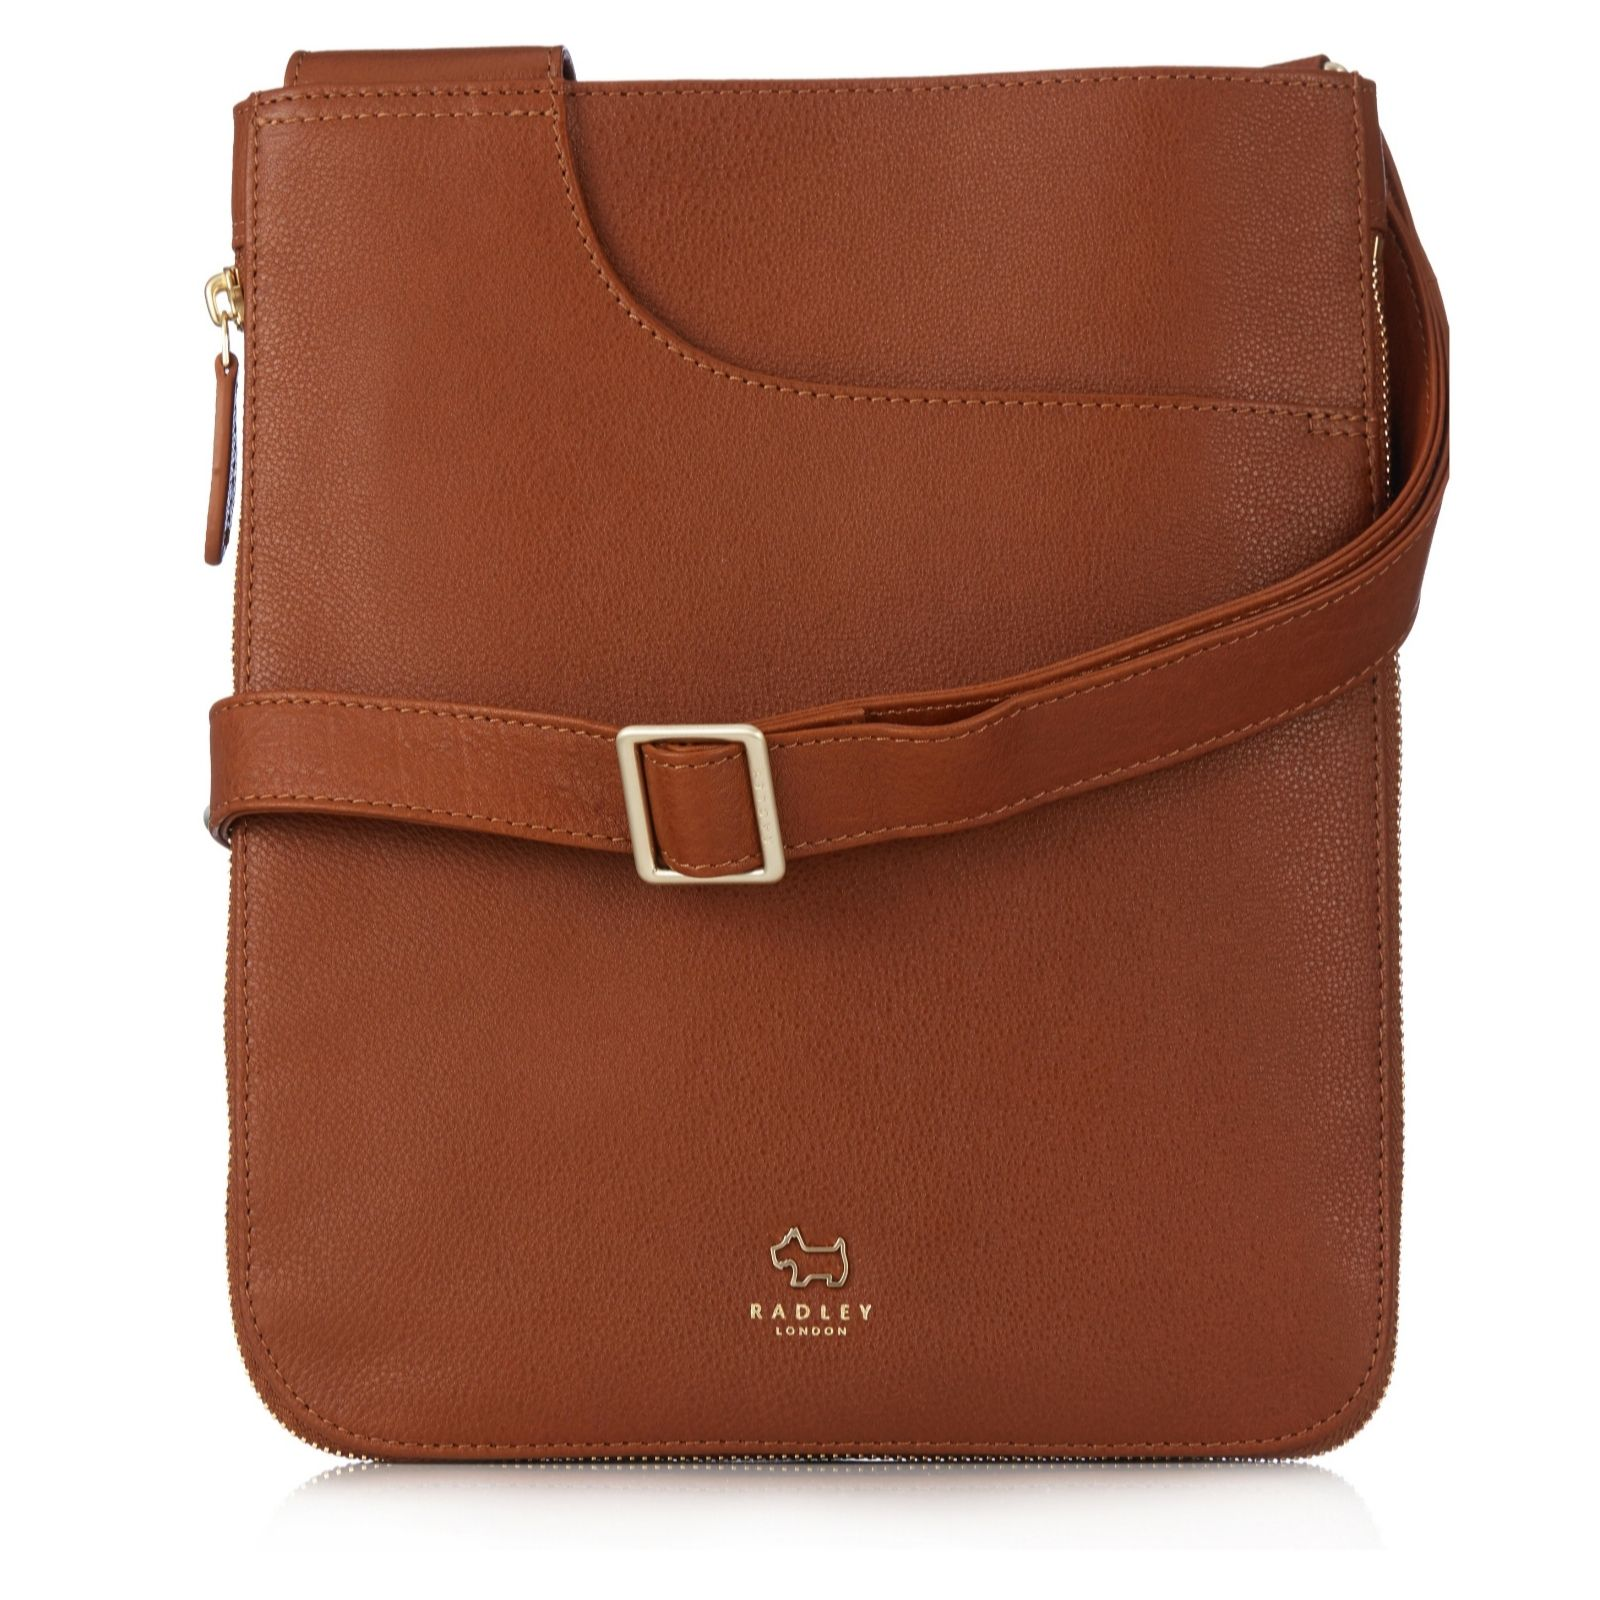 70512e6a0e Radley London Pockets Medium Leather Zip Top Crossbody Bag - QVC UK